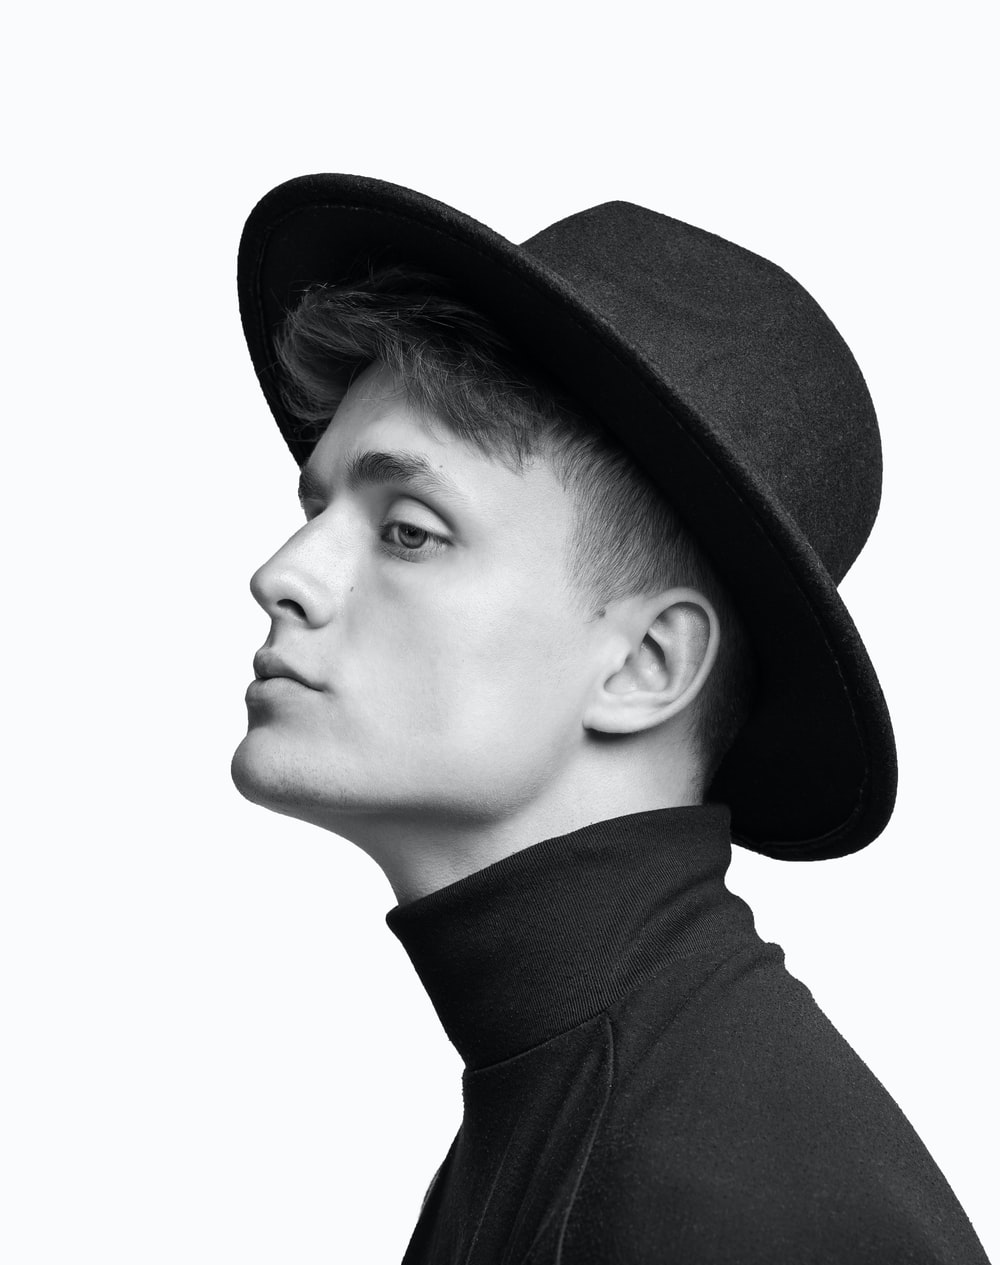 grayscale photo of man wearing black hat